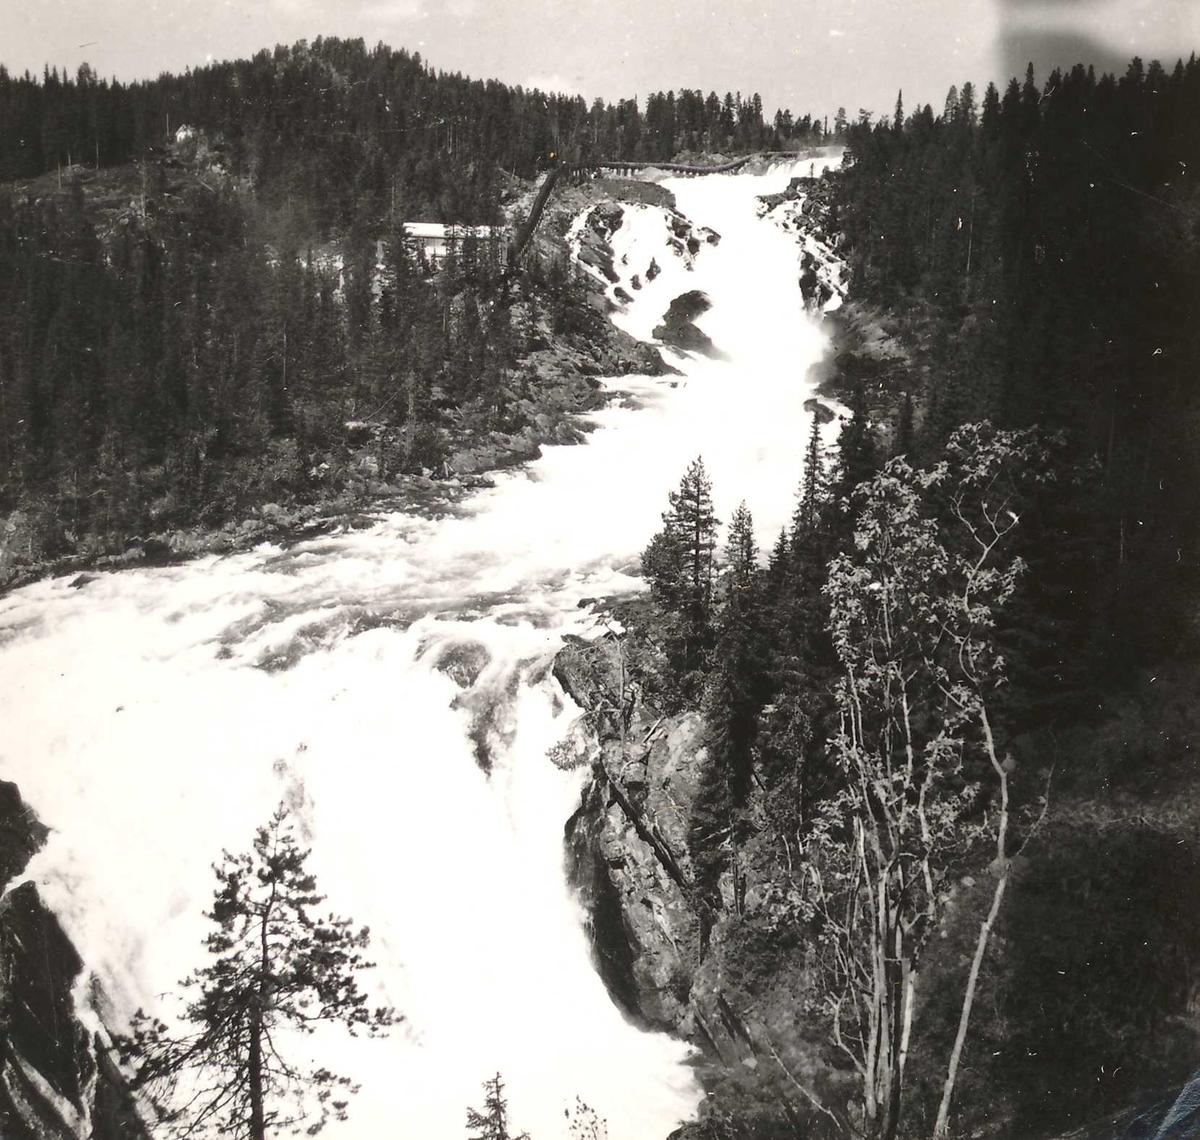 315-1 Hyllandsfossen